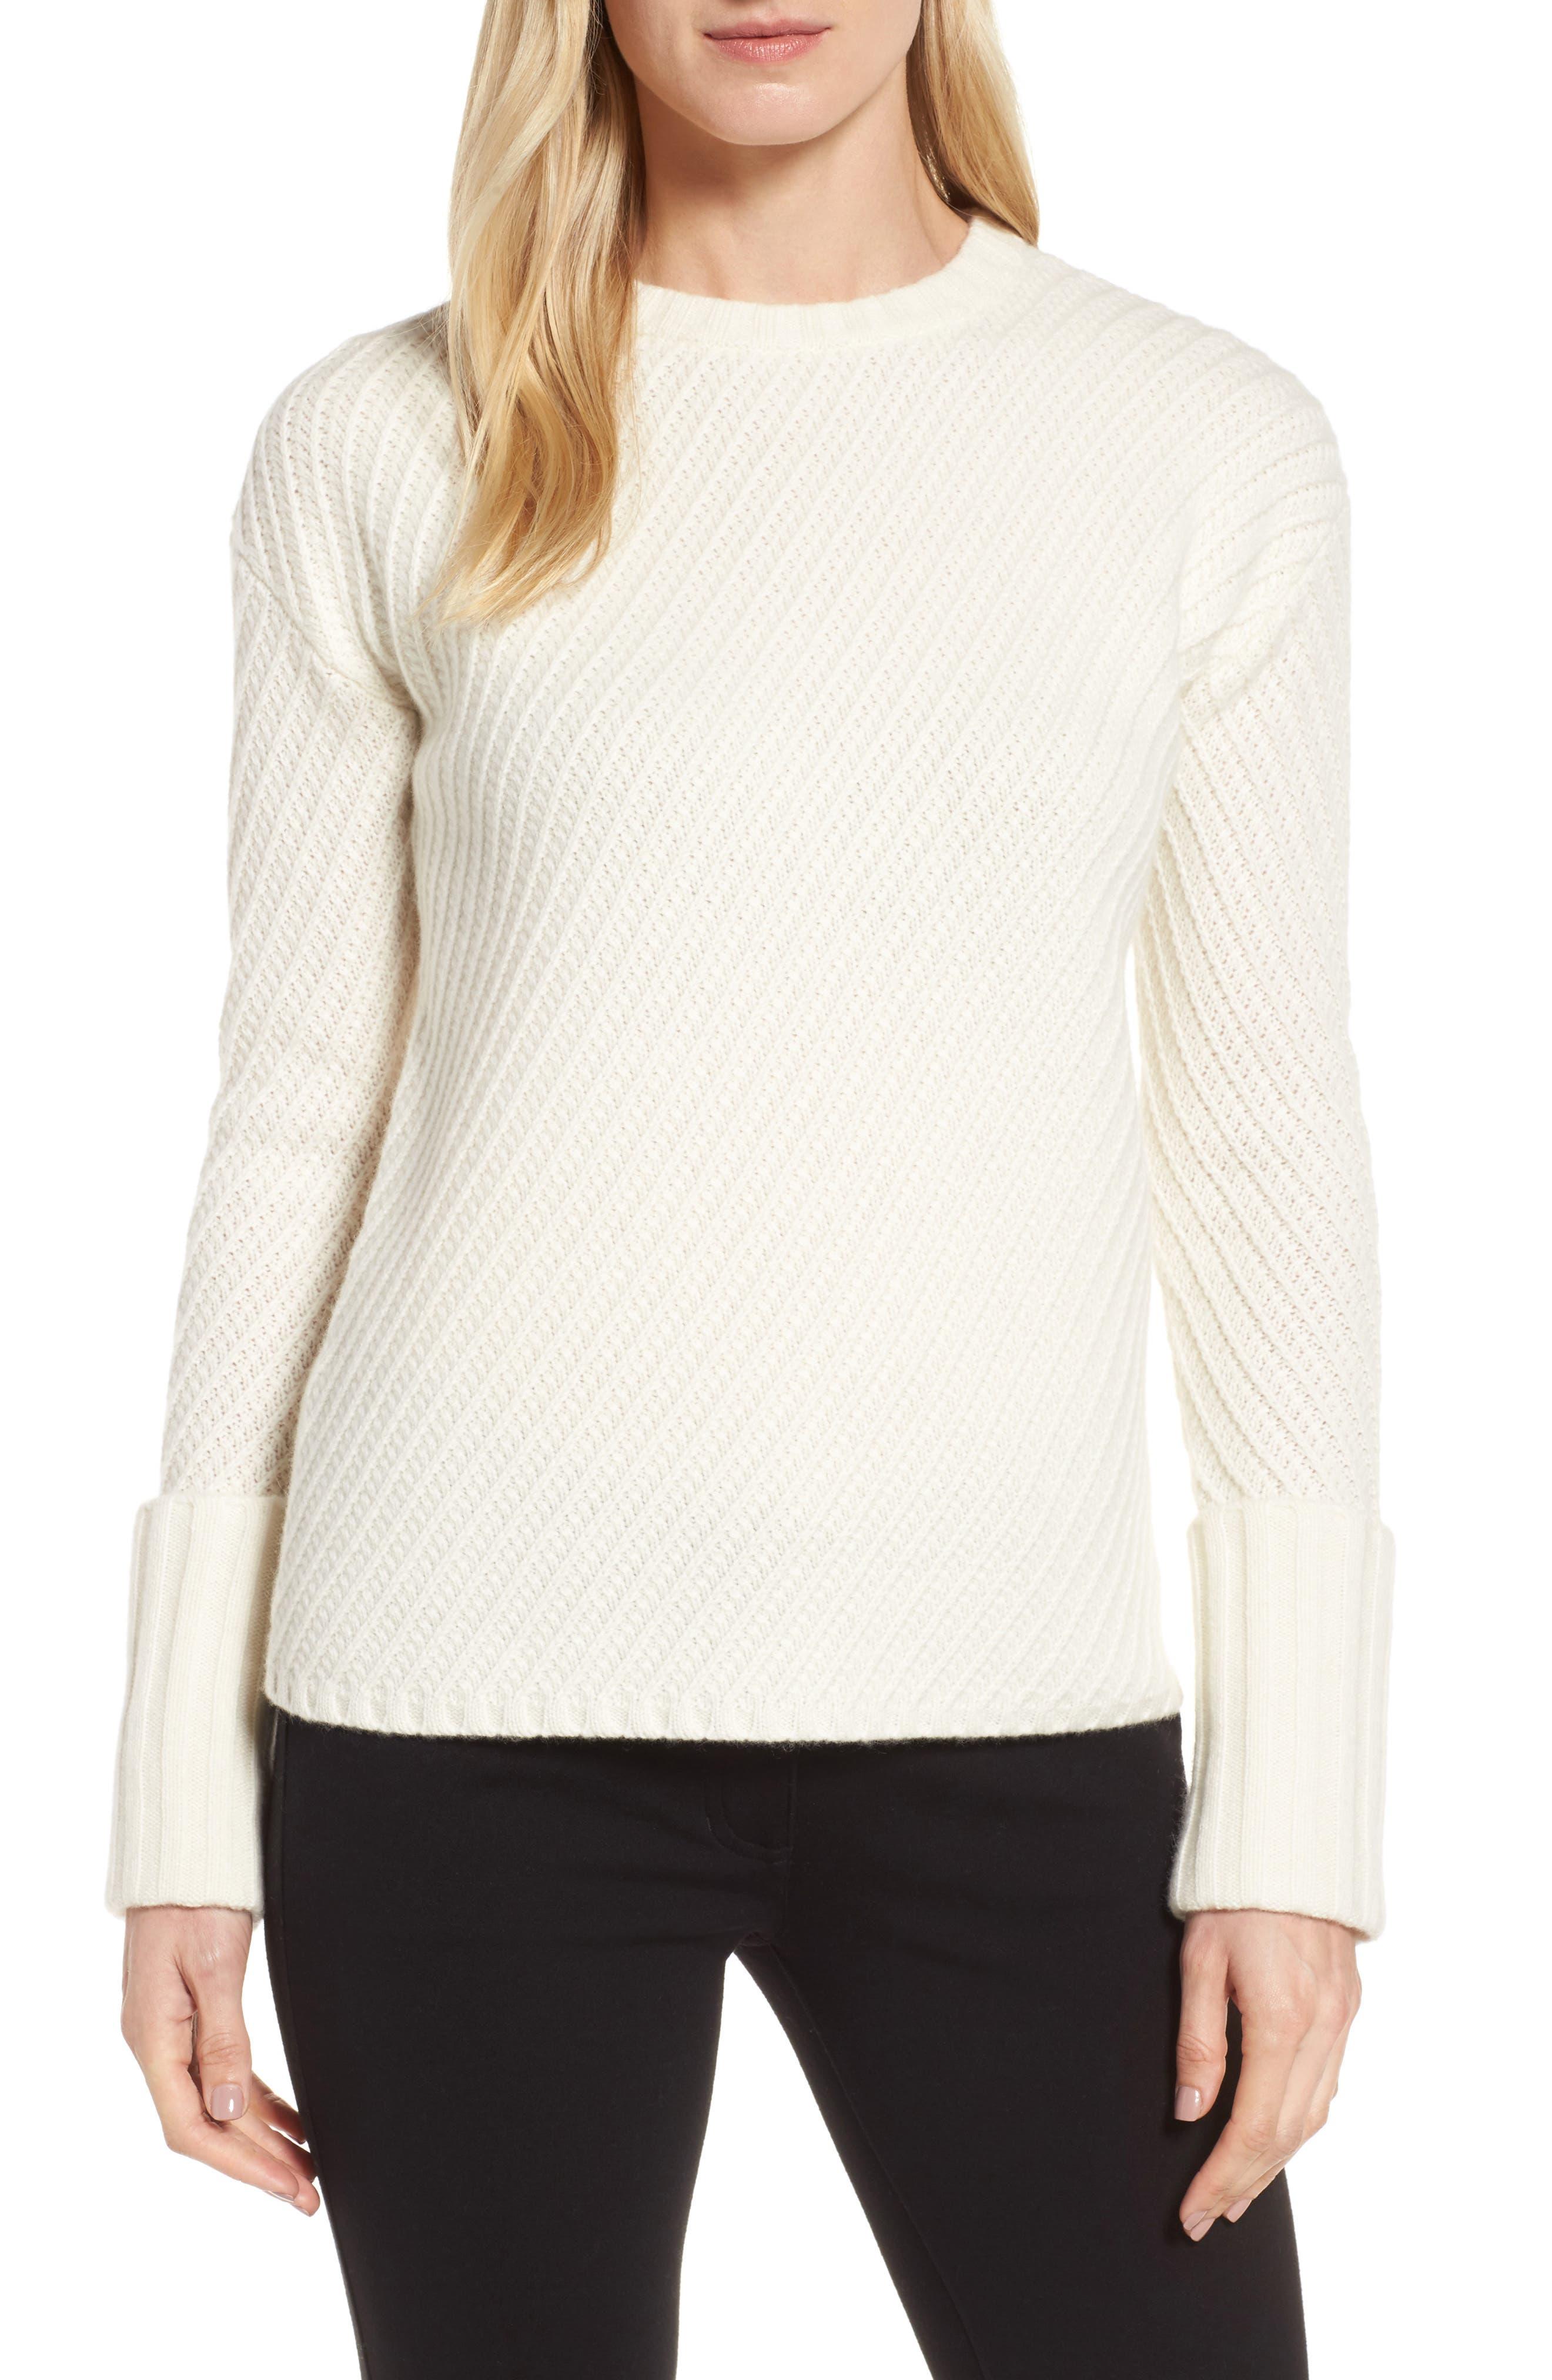 Nordstrom Signature Textured Cashmere Sweater